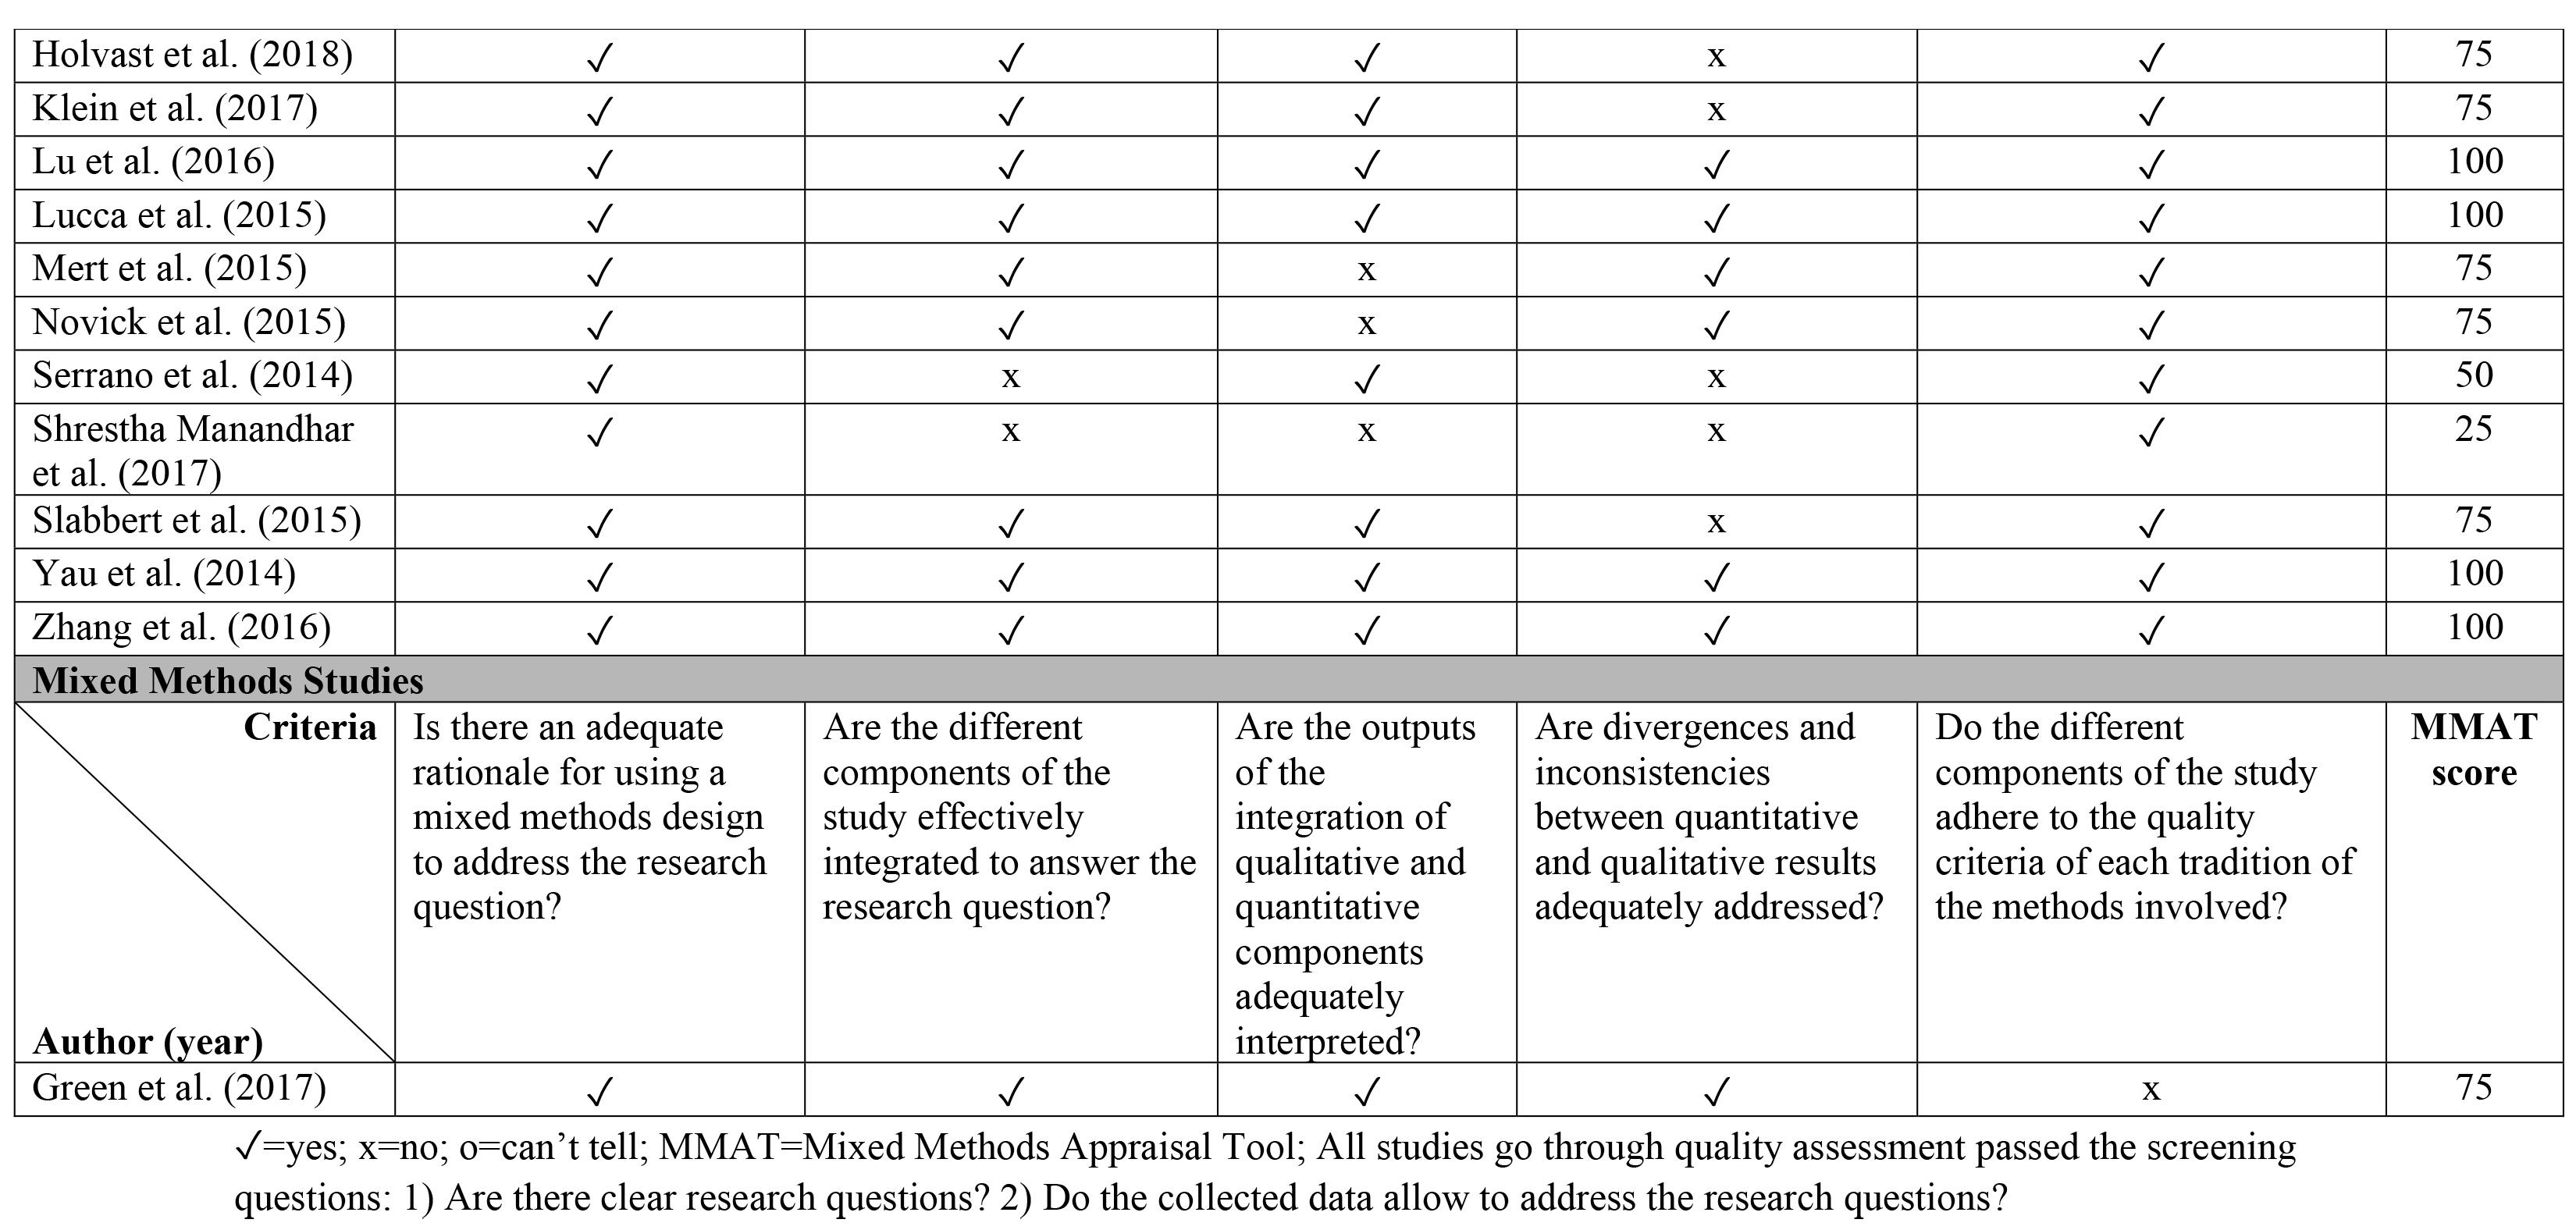 Quality of Studies by Mixed Methods Appraisal Tool (MMAT) (n = 37)